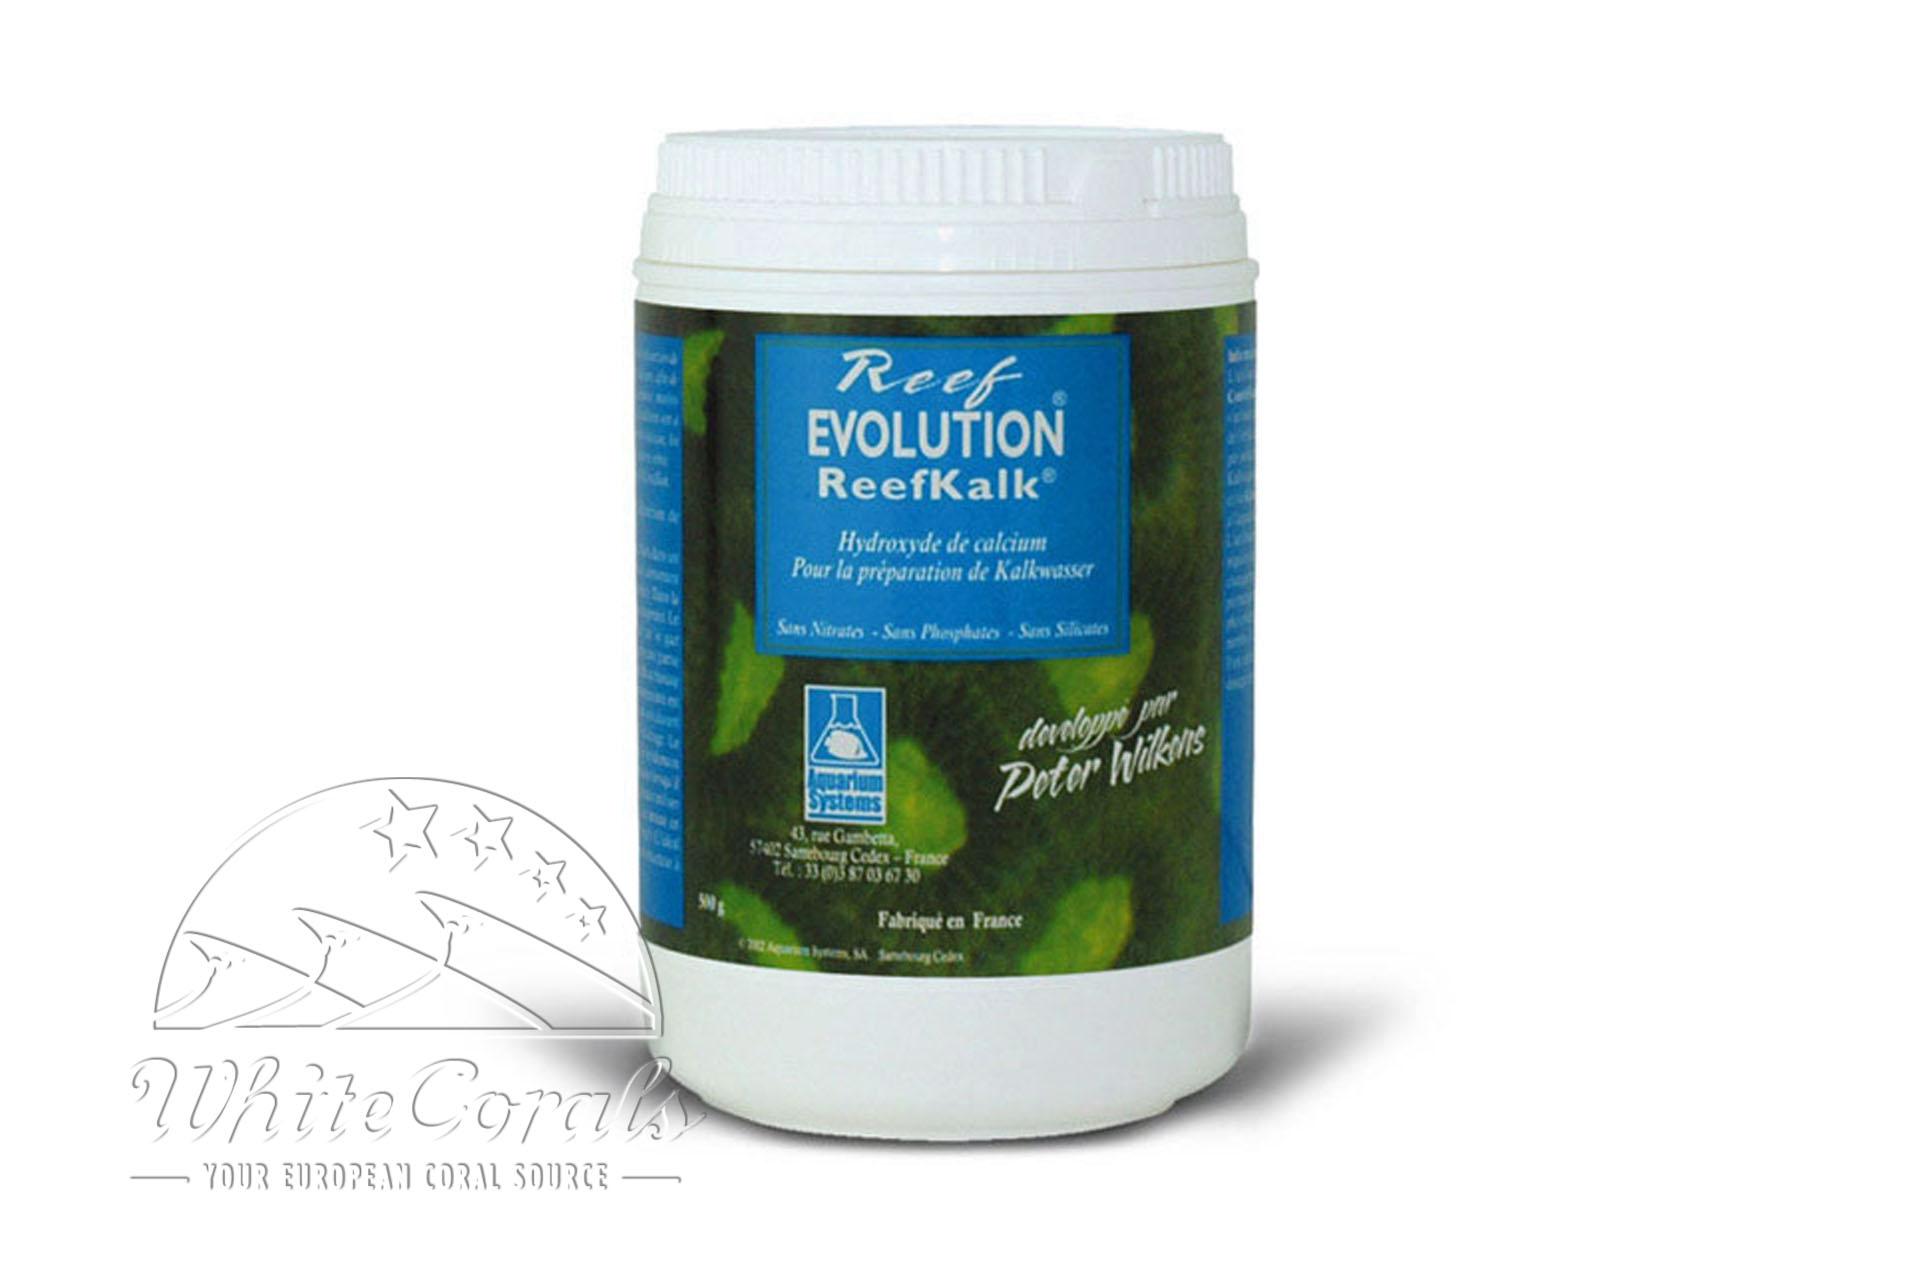 Aquarium Systems Reef Evolution ReefKalk